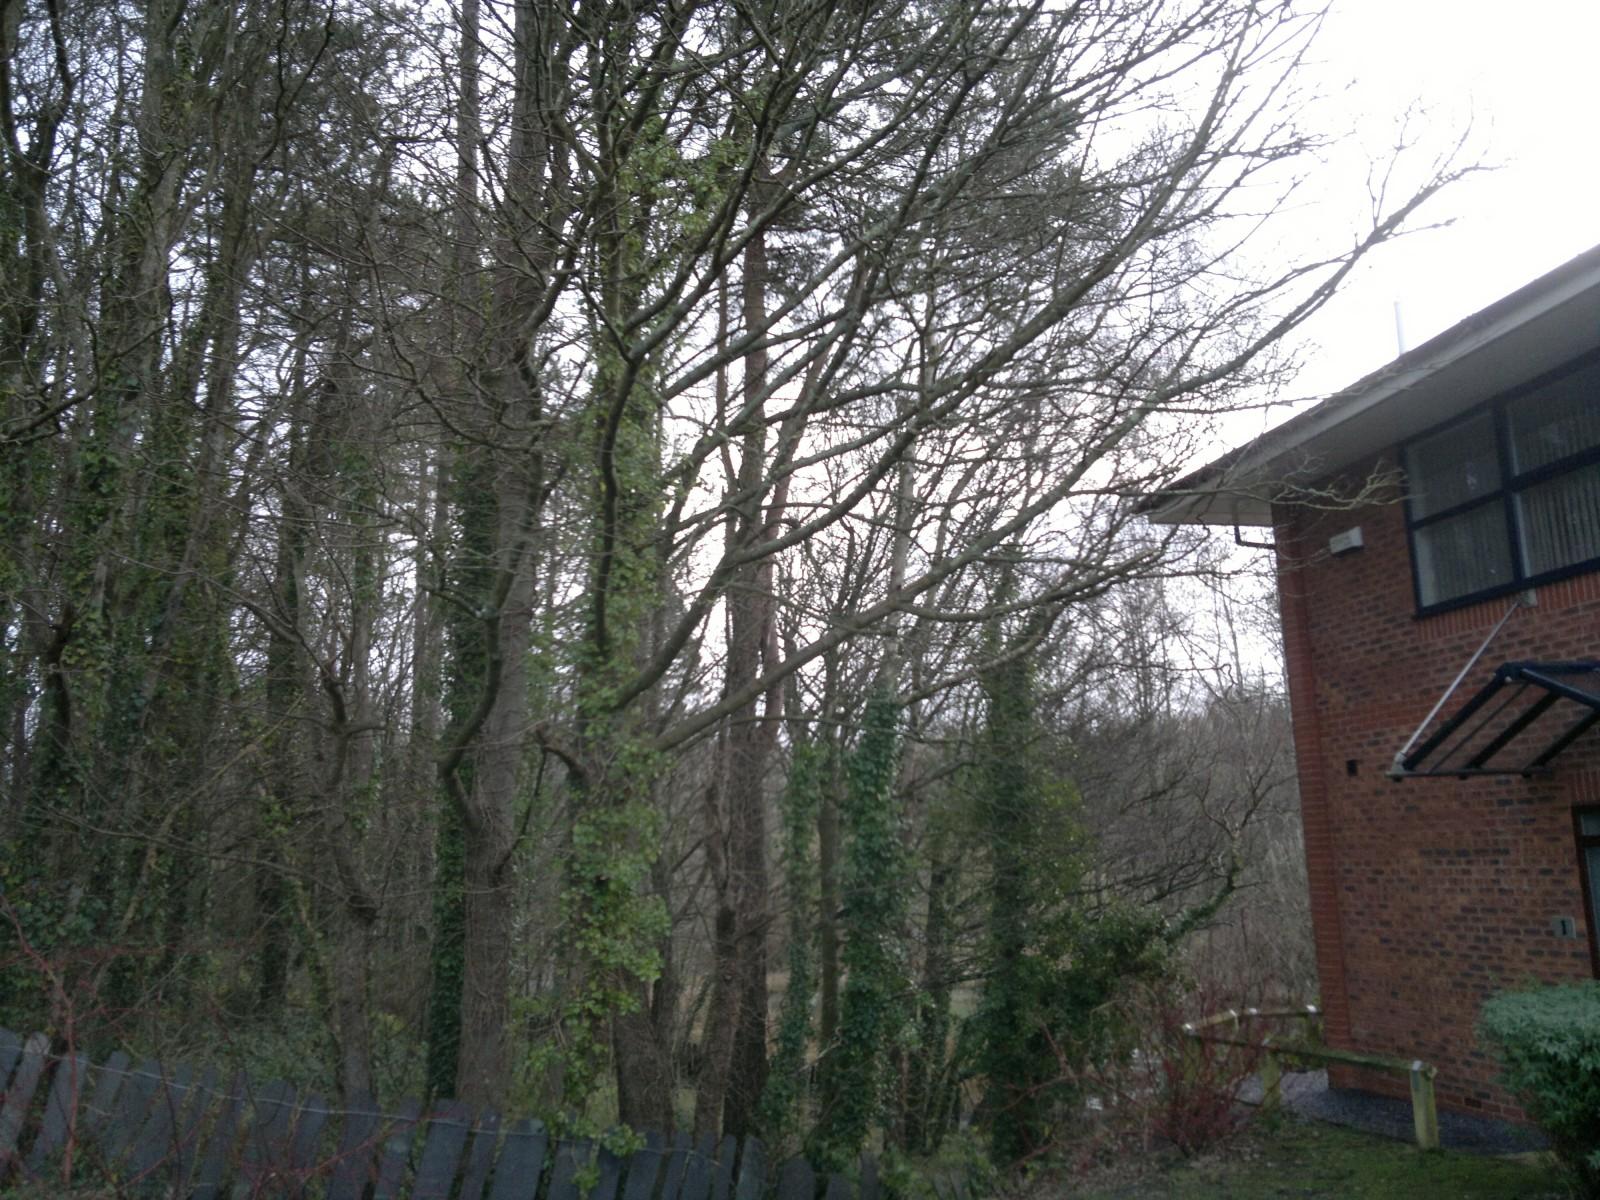 Branches overhanging property, Bangor, Gwynedd.